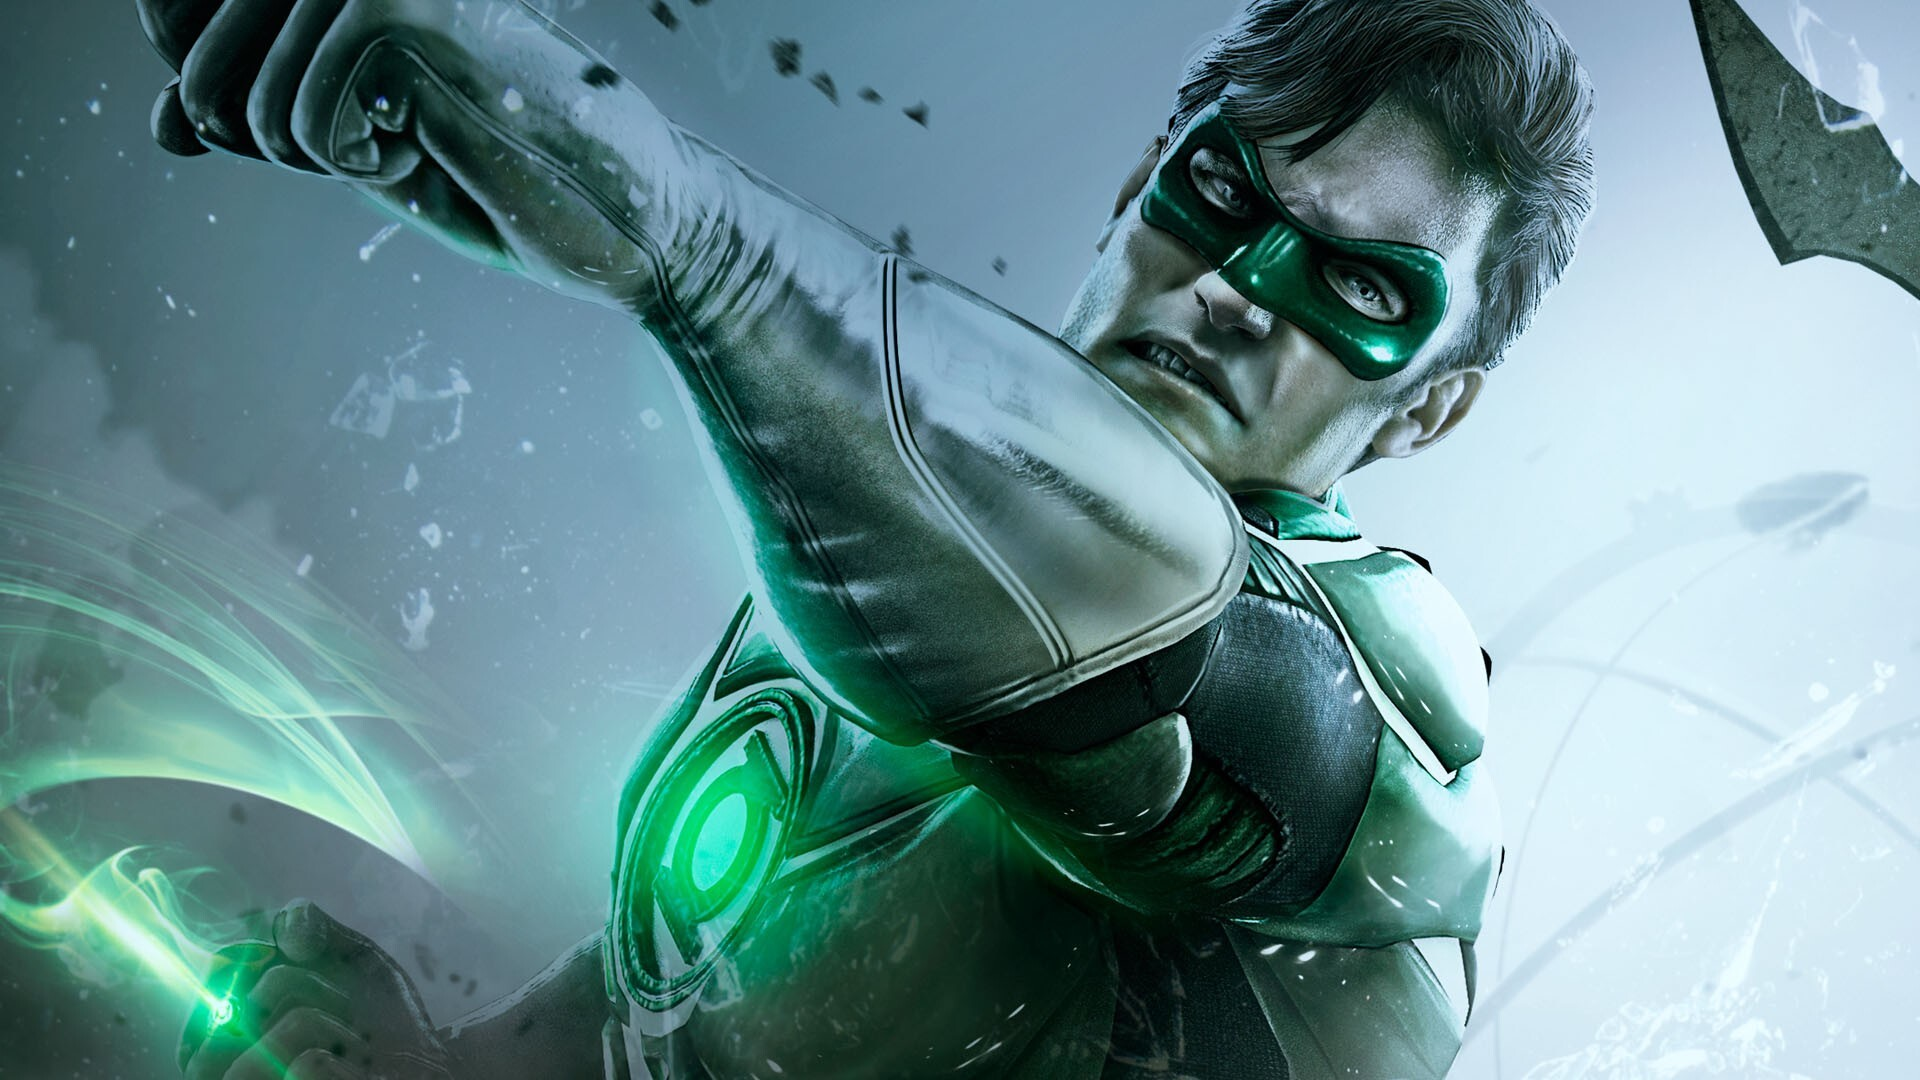 green-lantern-2-wallpaper.jpg